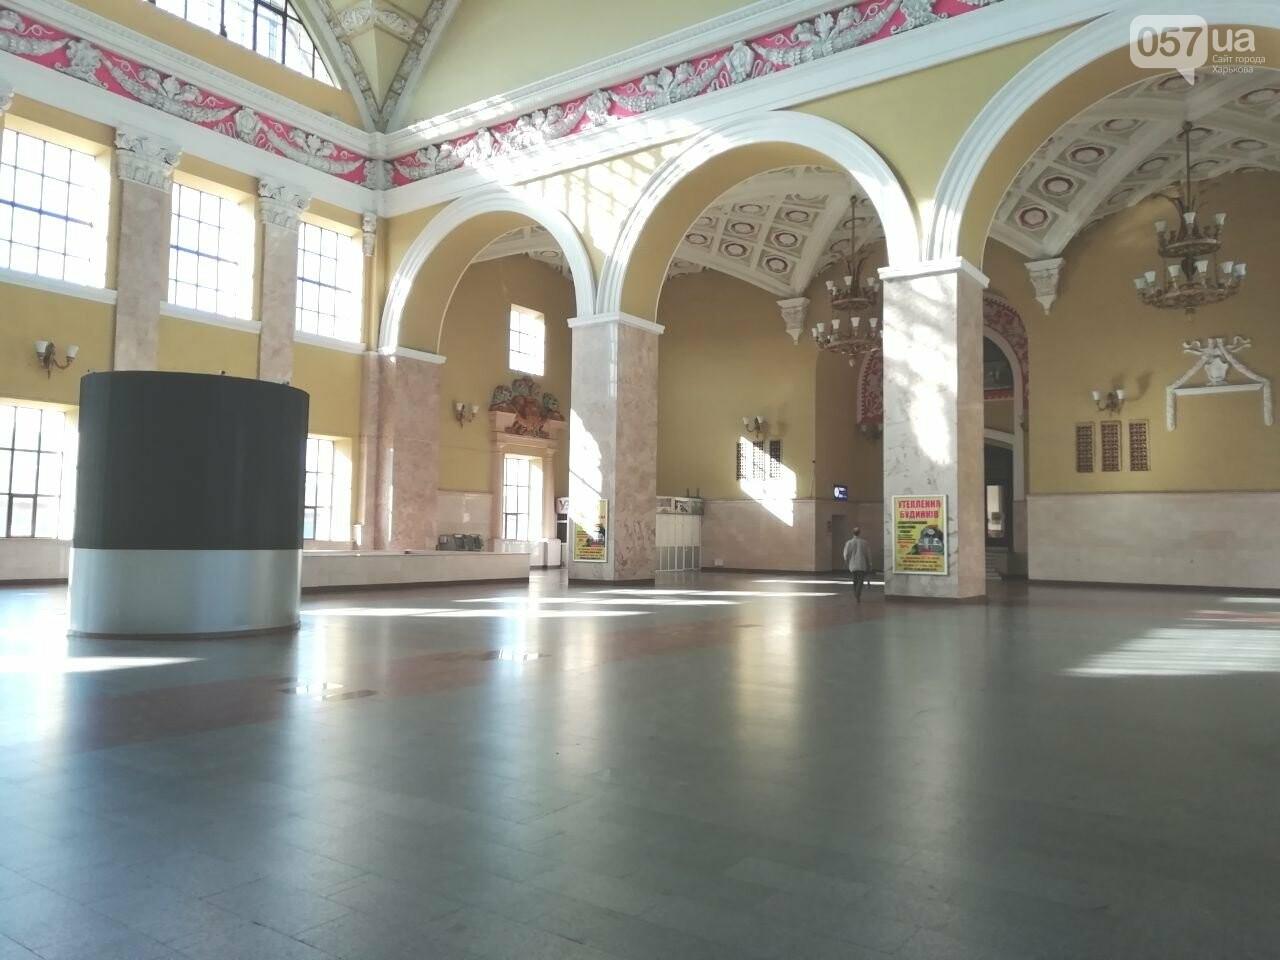 Безлюдный вокзал и дезинфекция трамваев: как живет ЮЖД во время карантина, - ФОТО, фото-16